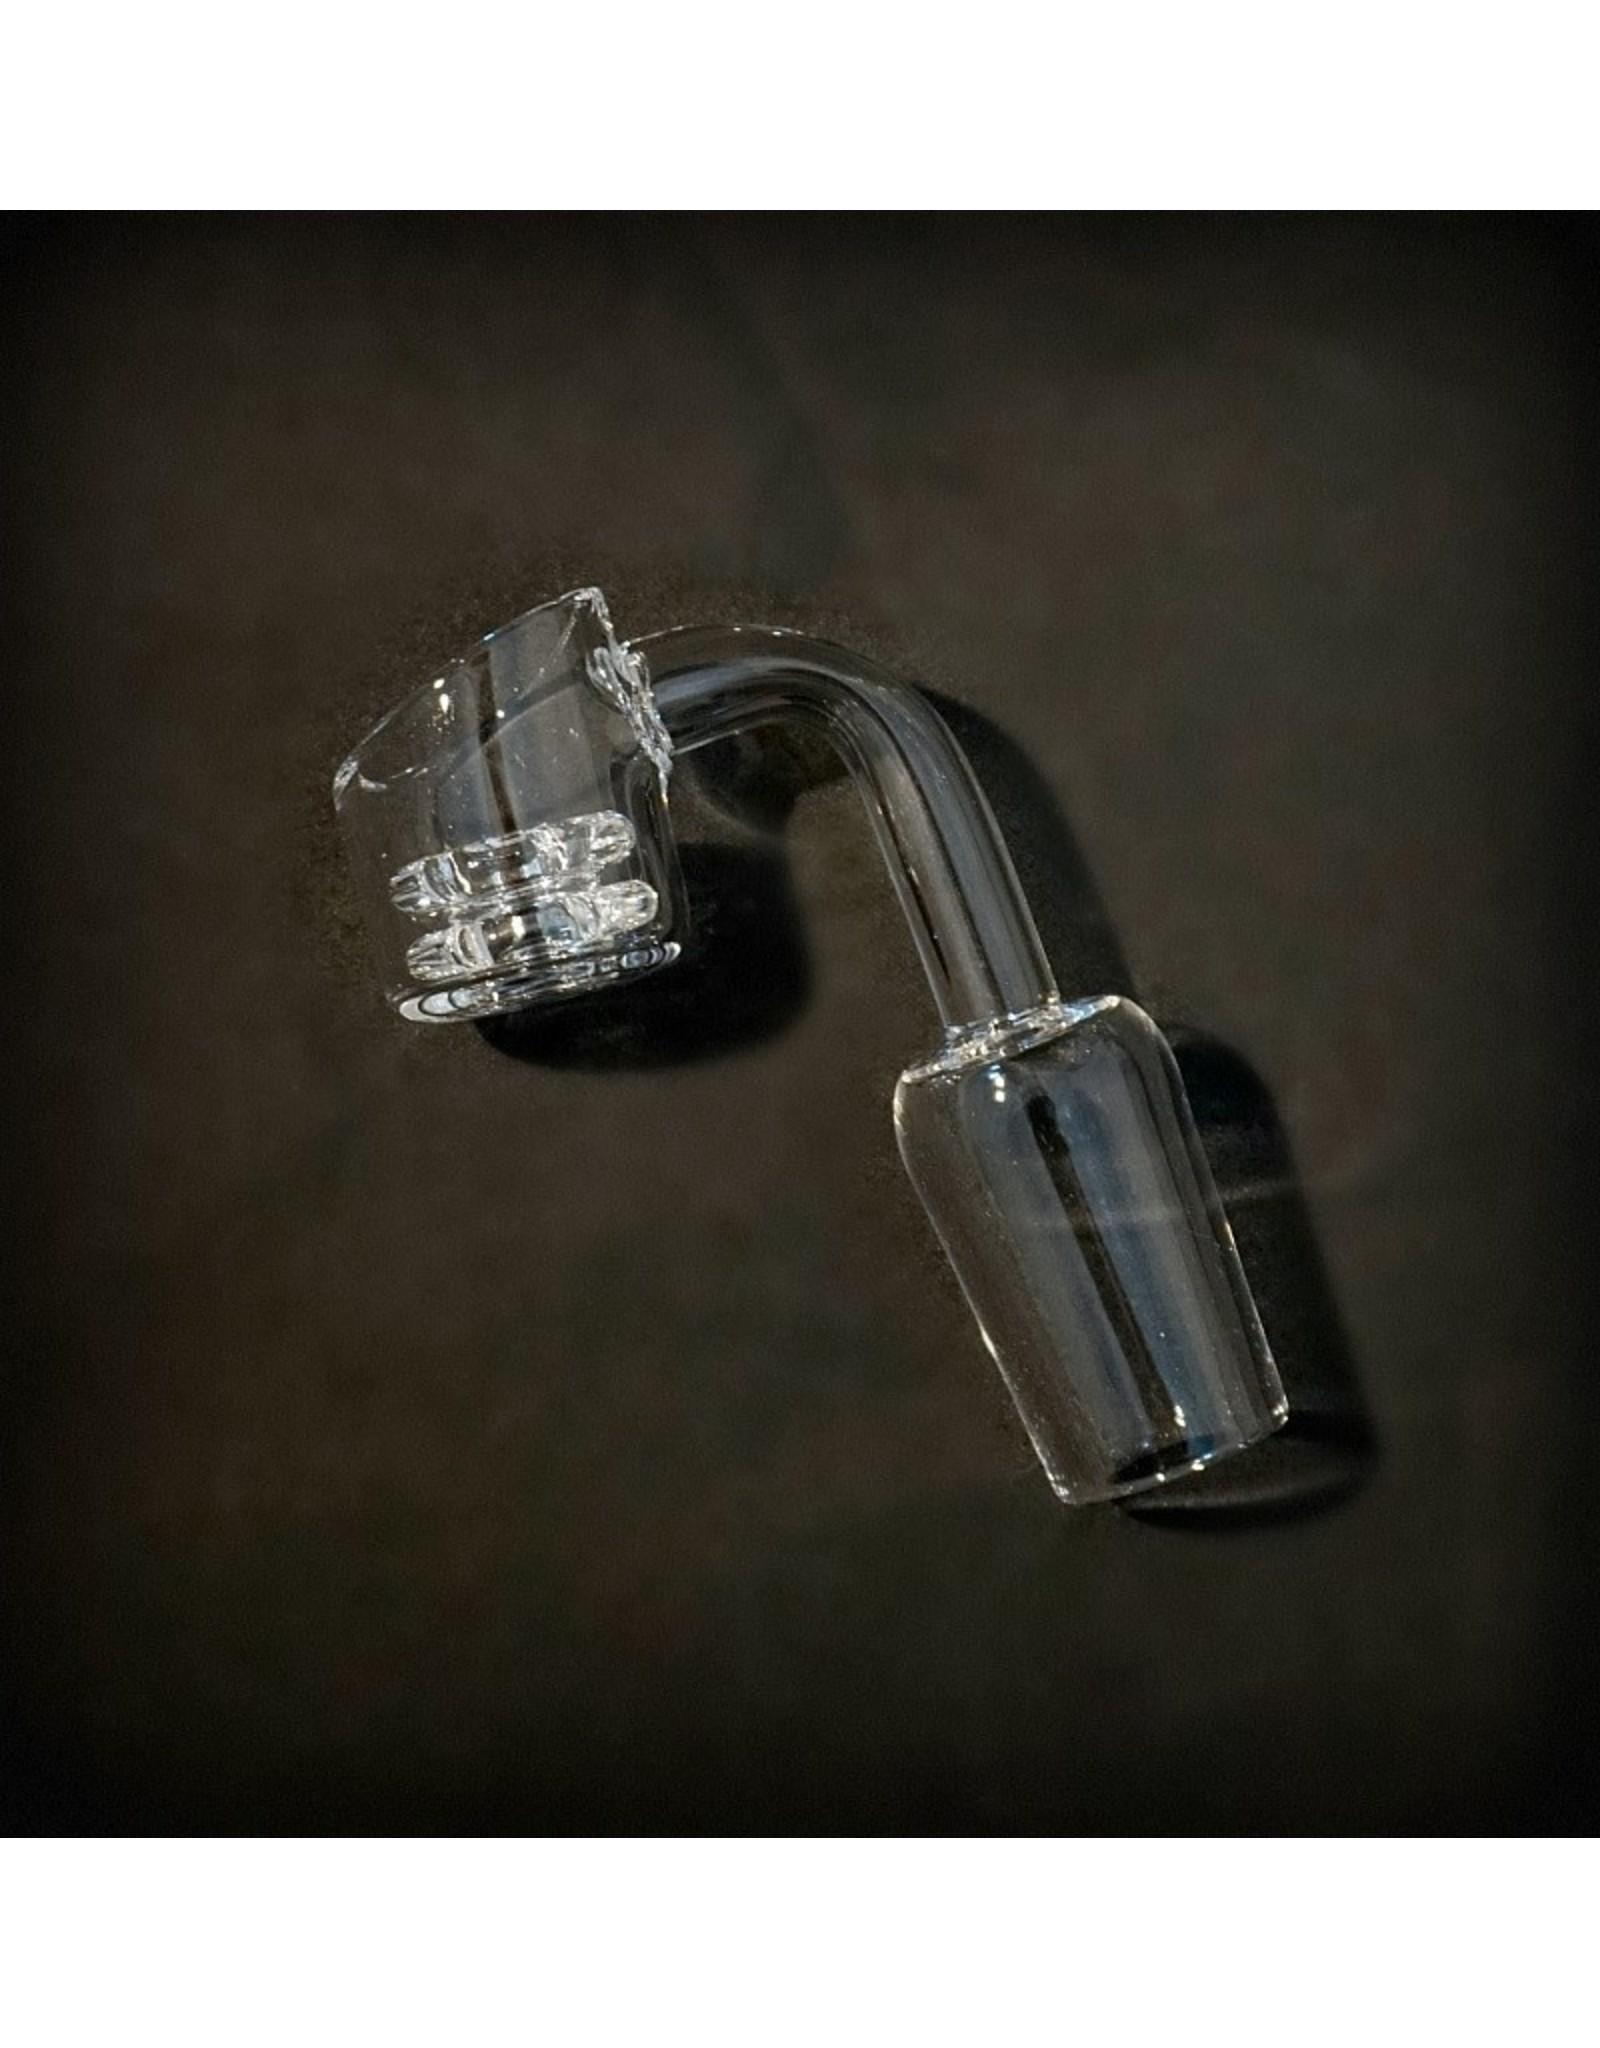 Diamond Knot Banger 19mm Male 90°